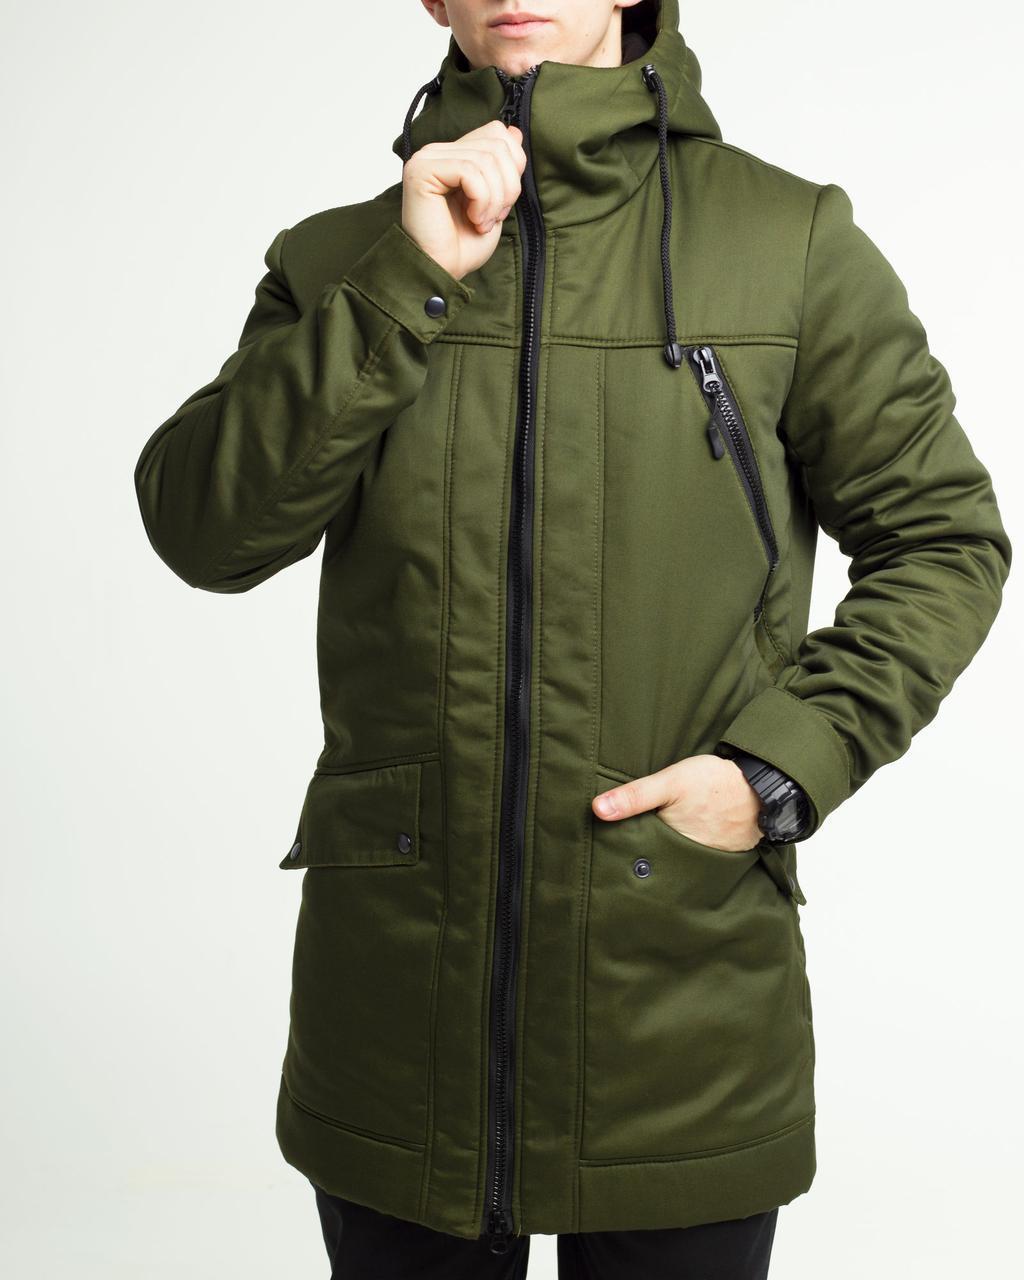 Зимняя куртка парка мужская хаки водоотталкивающая Гризли (Grizli) от бренда ТУР размер S, M, L, XL, XXL